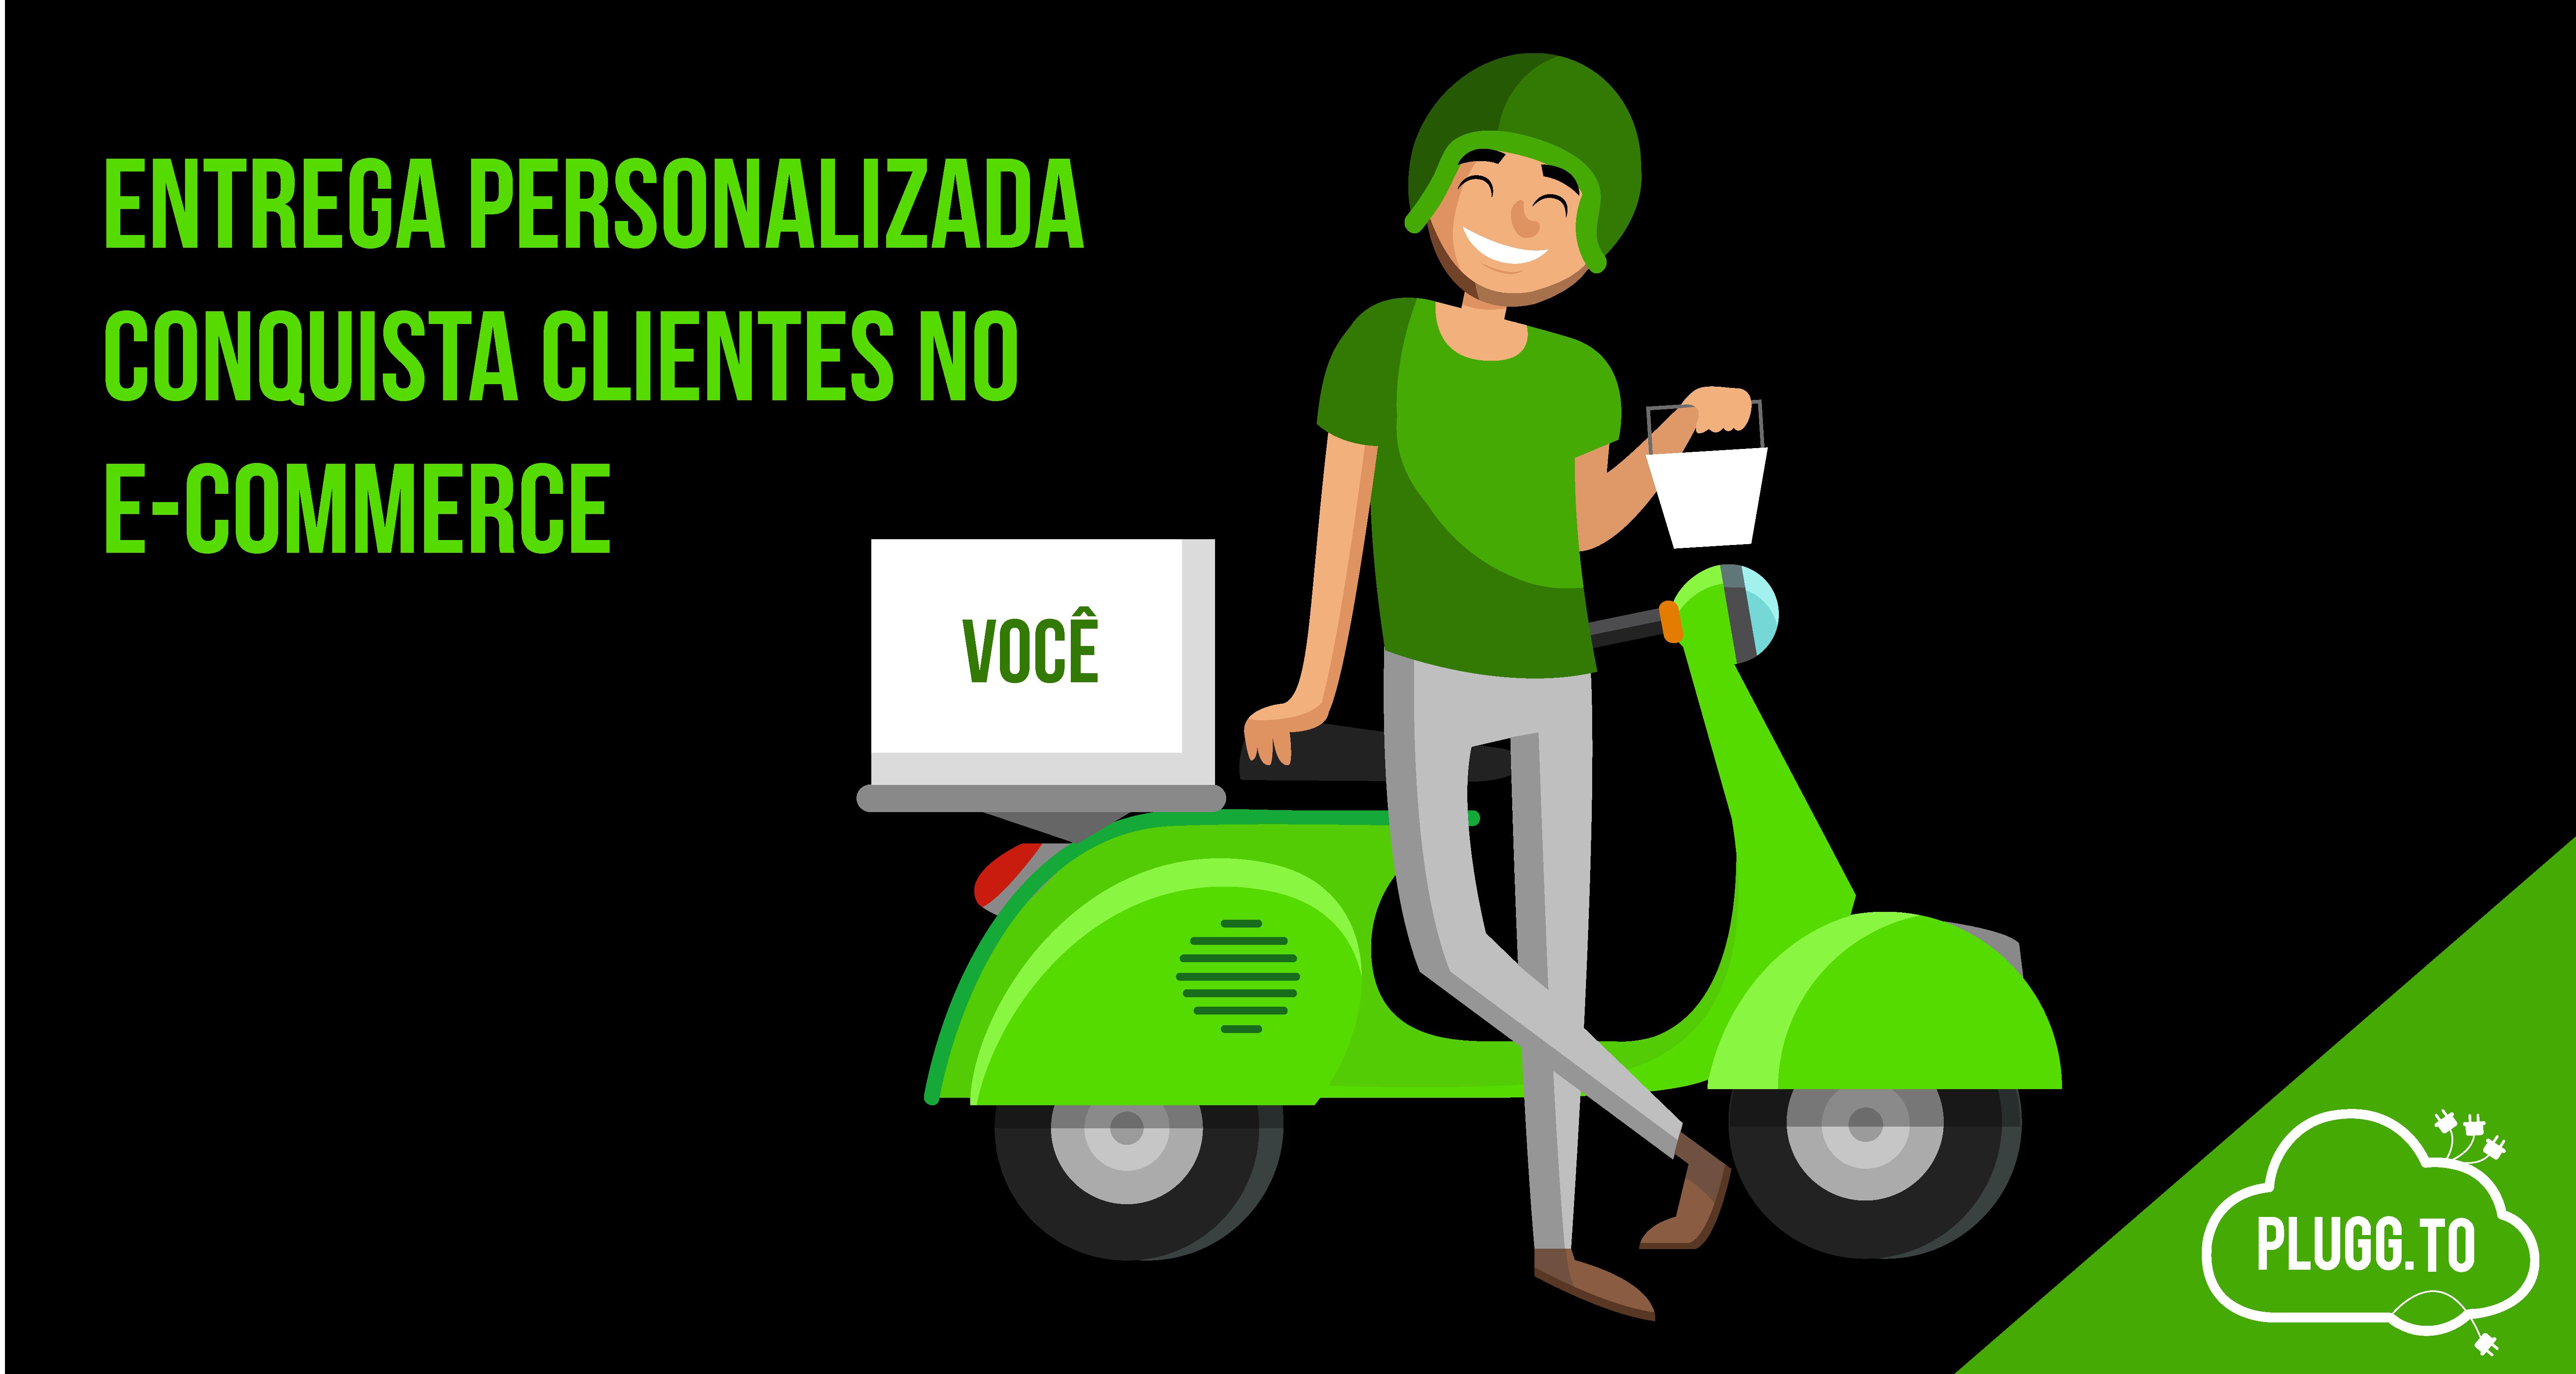 Entrega Personalizada conquista clientes no e-commerce